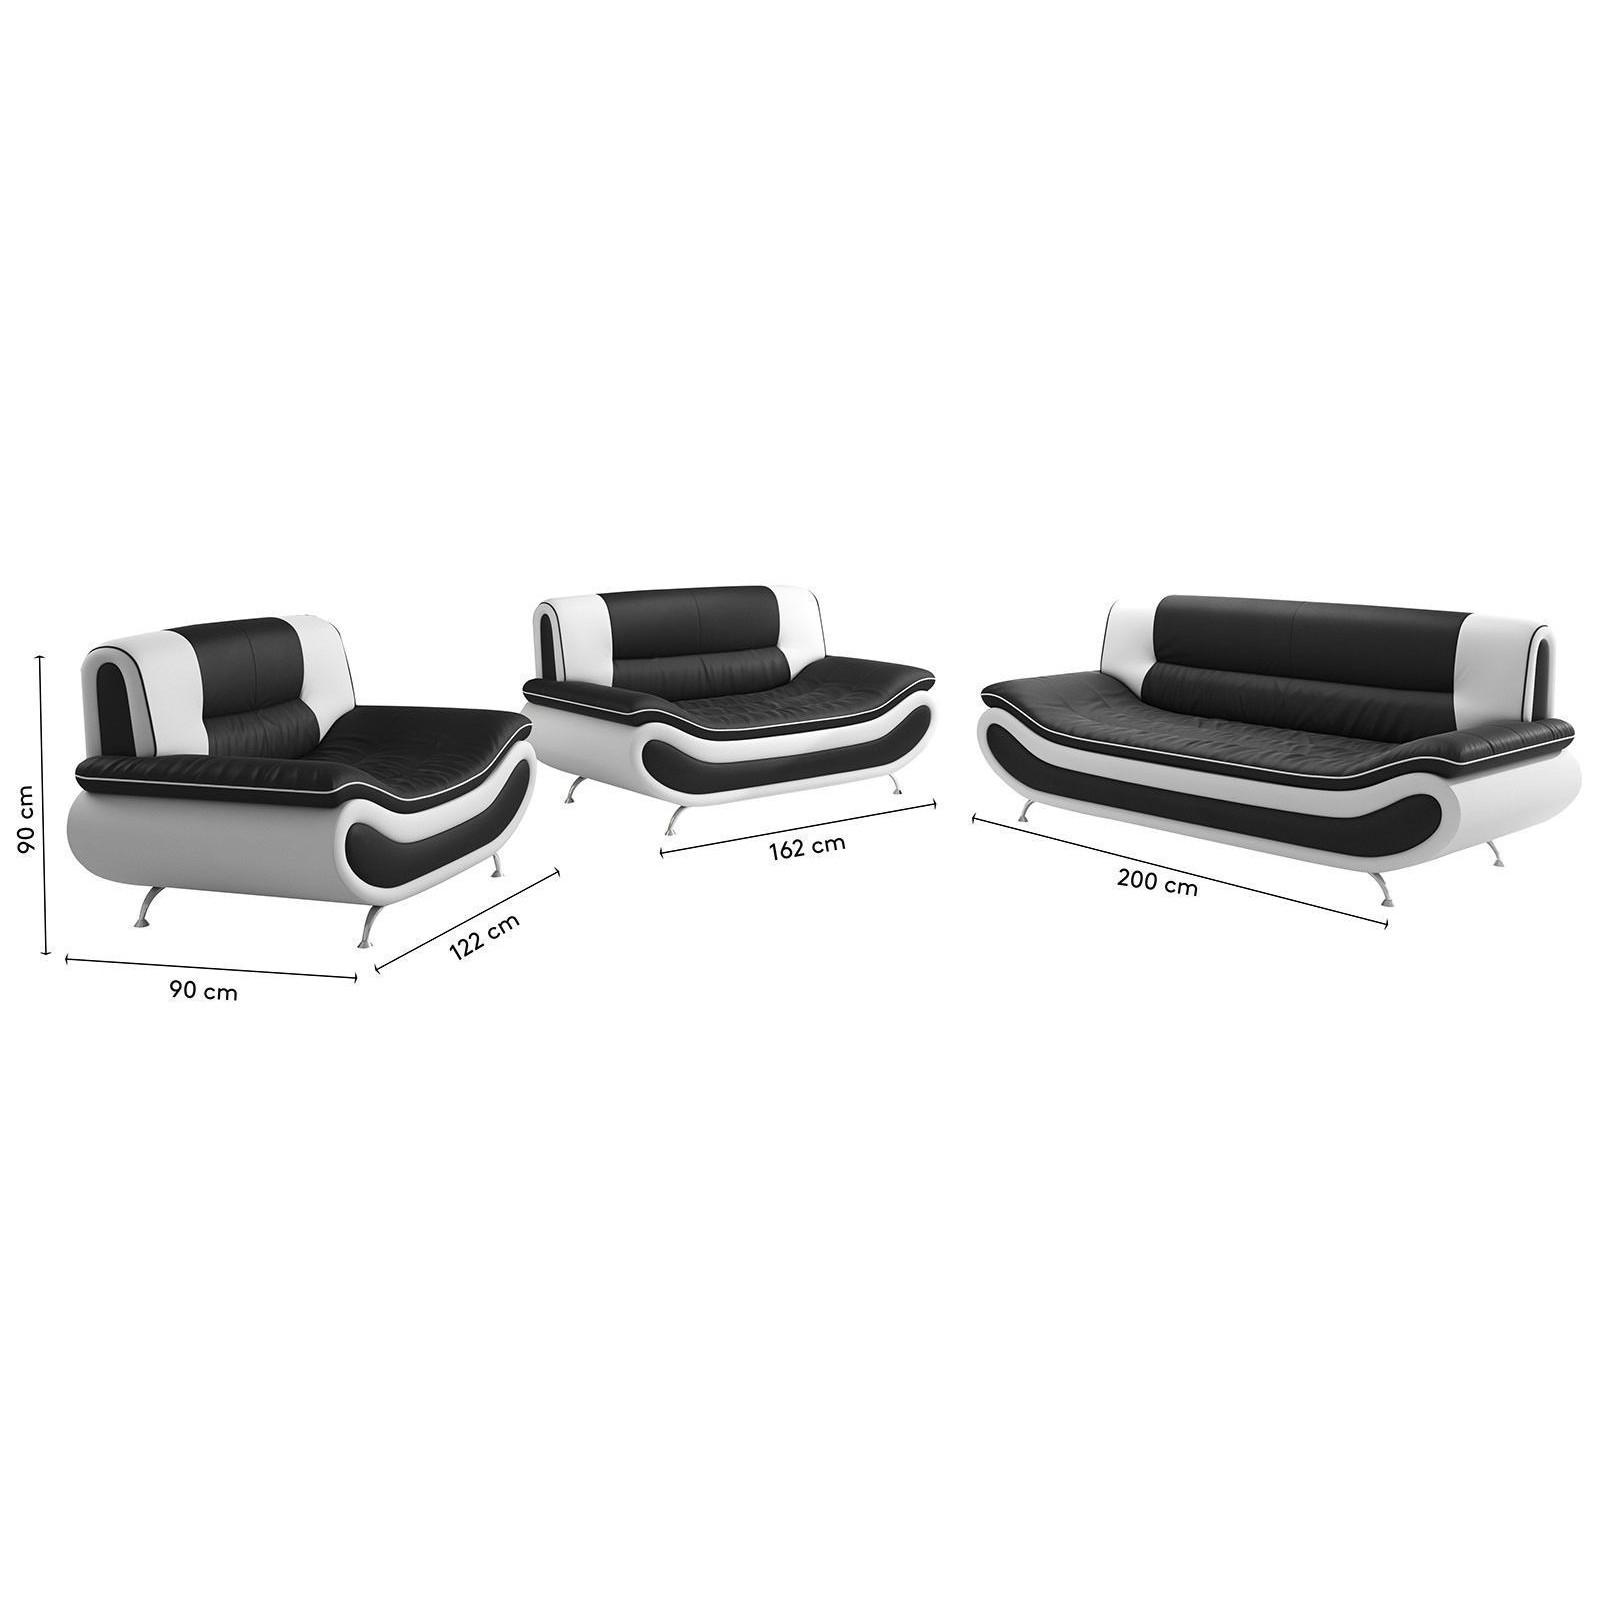 Salon Canapé 3 places design ROBINHOOD en simili cuir